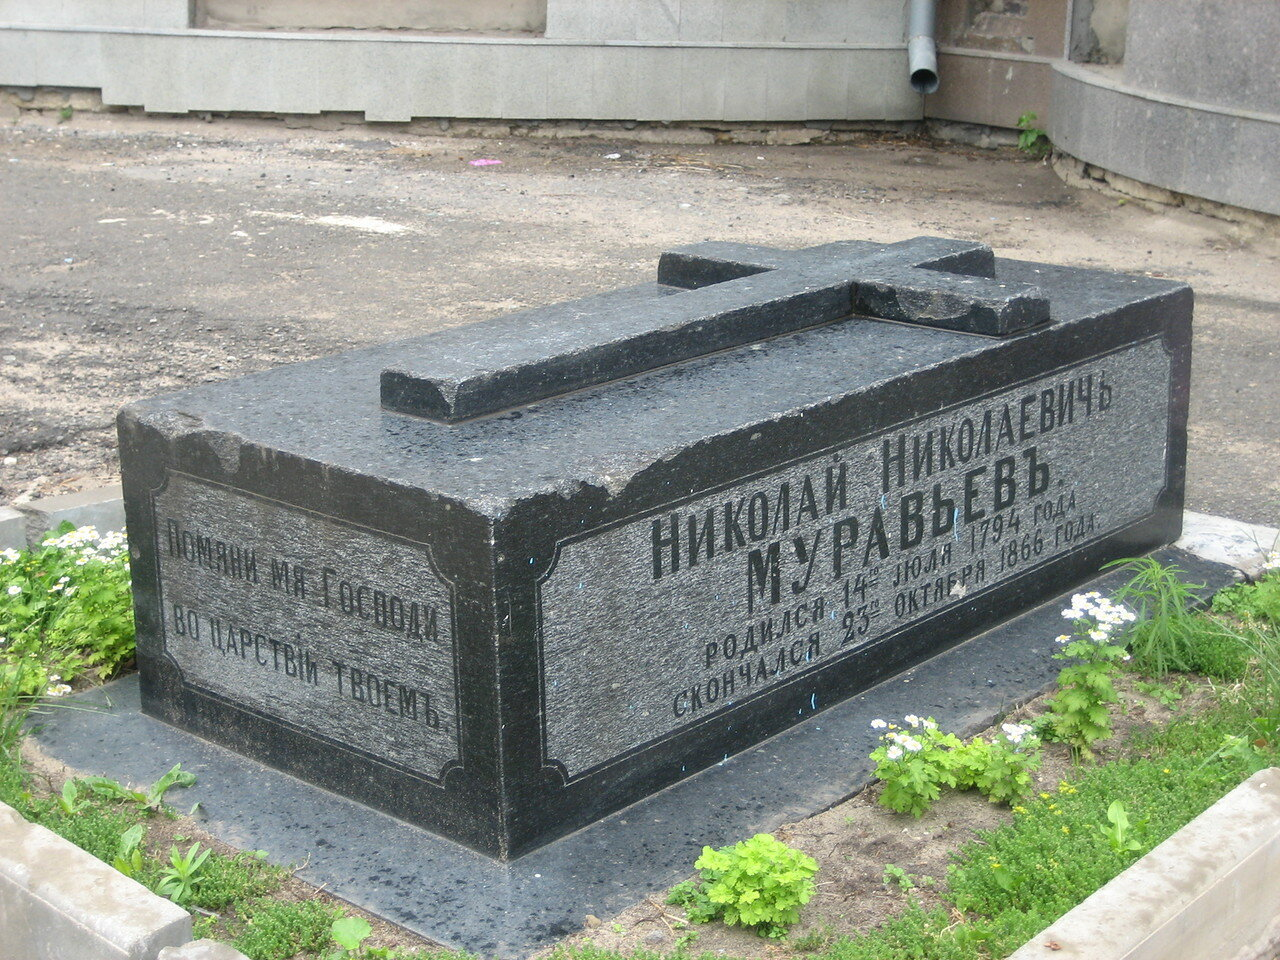 https://img-fotki.yandex.ru/get/198569/199368979.29/0_1e18fd_b52836c2_XXXL.jpg